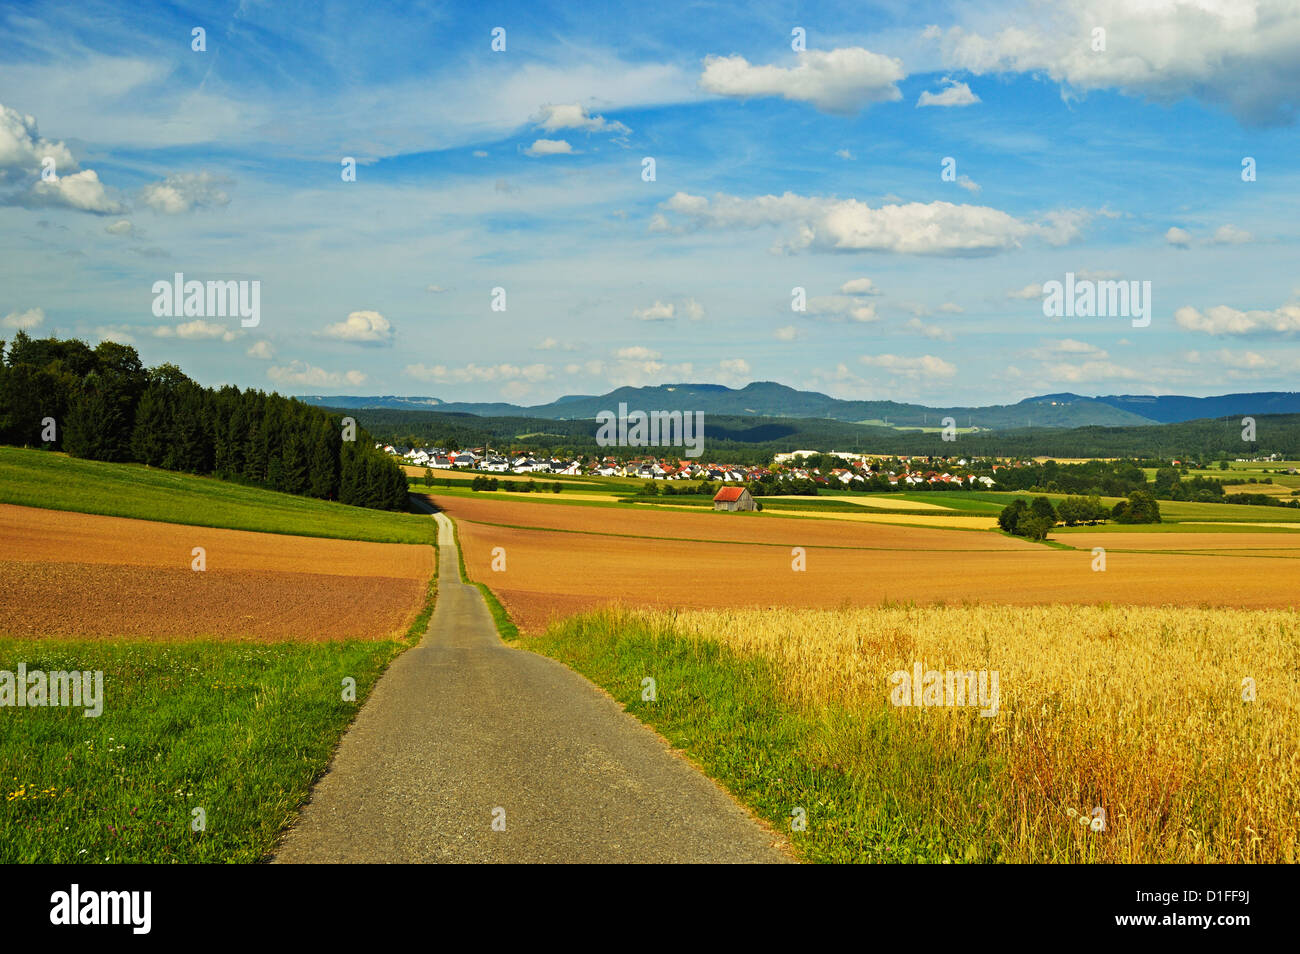 Escena rural, la aldea de Lauffen, cerca de Rottweil, Selva Negra, Schwarzwald-Baar, Baden-Wurttemberg, Alemania, Foto de stock